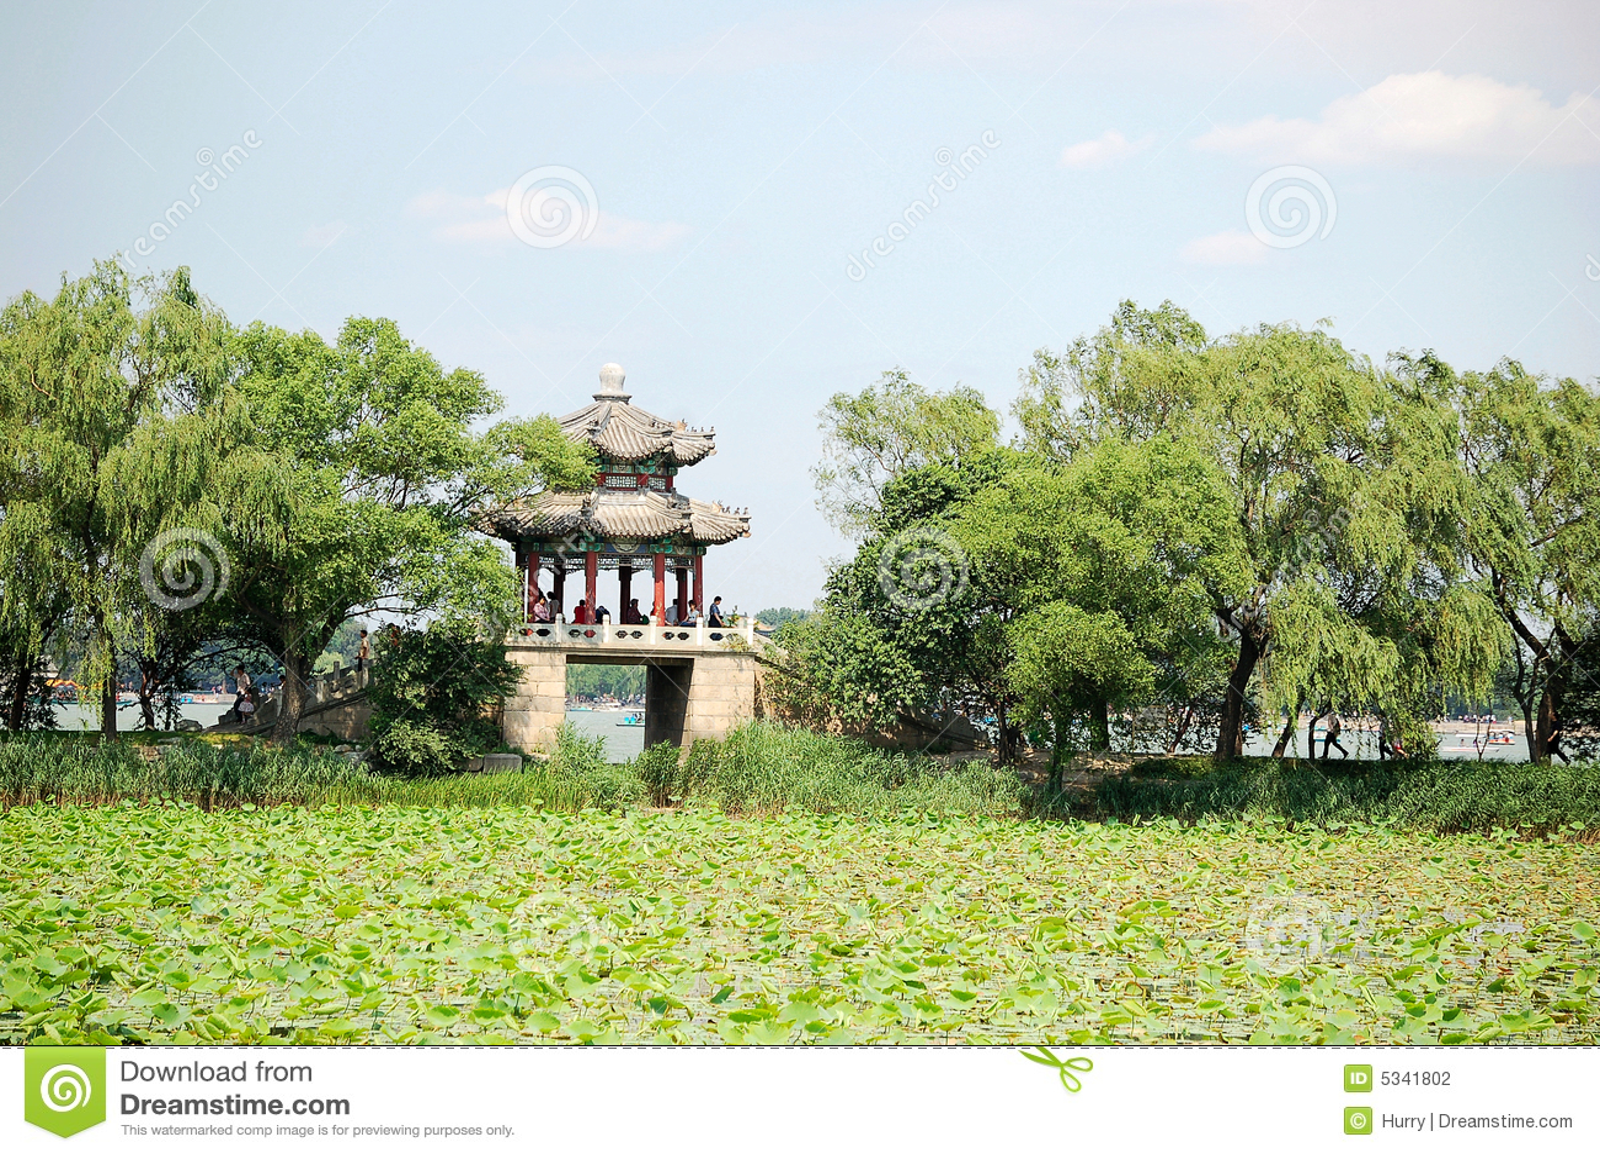 Pavilion, Summer Palace